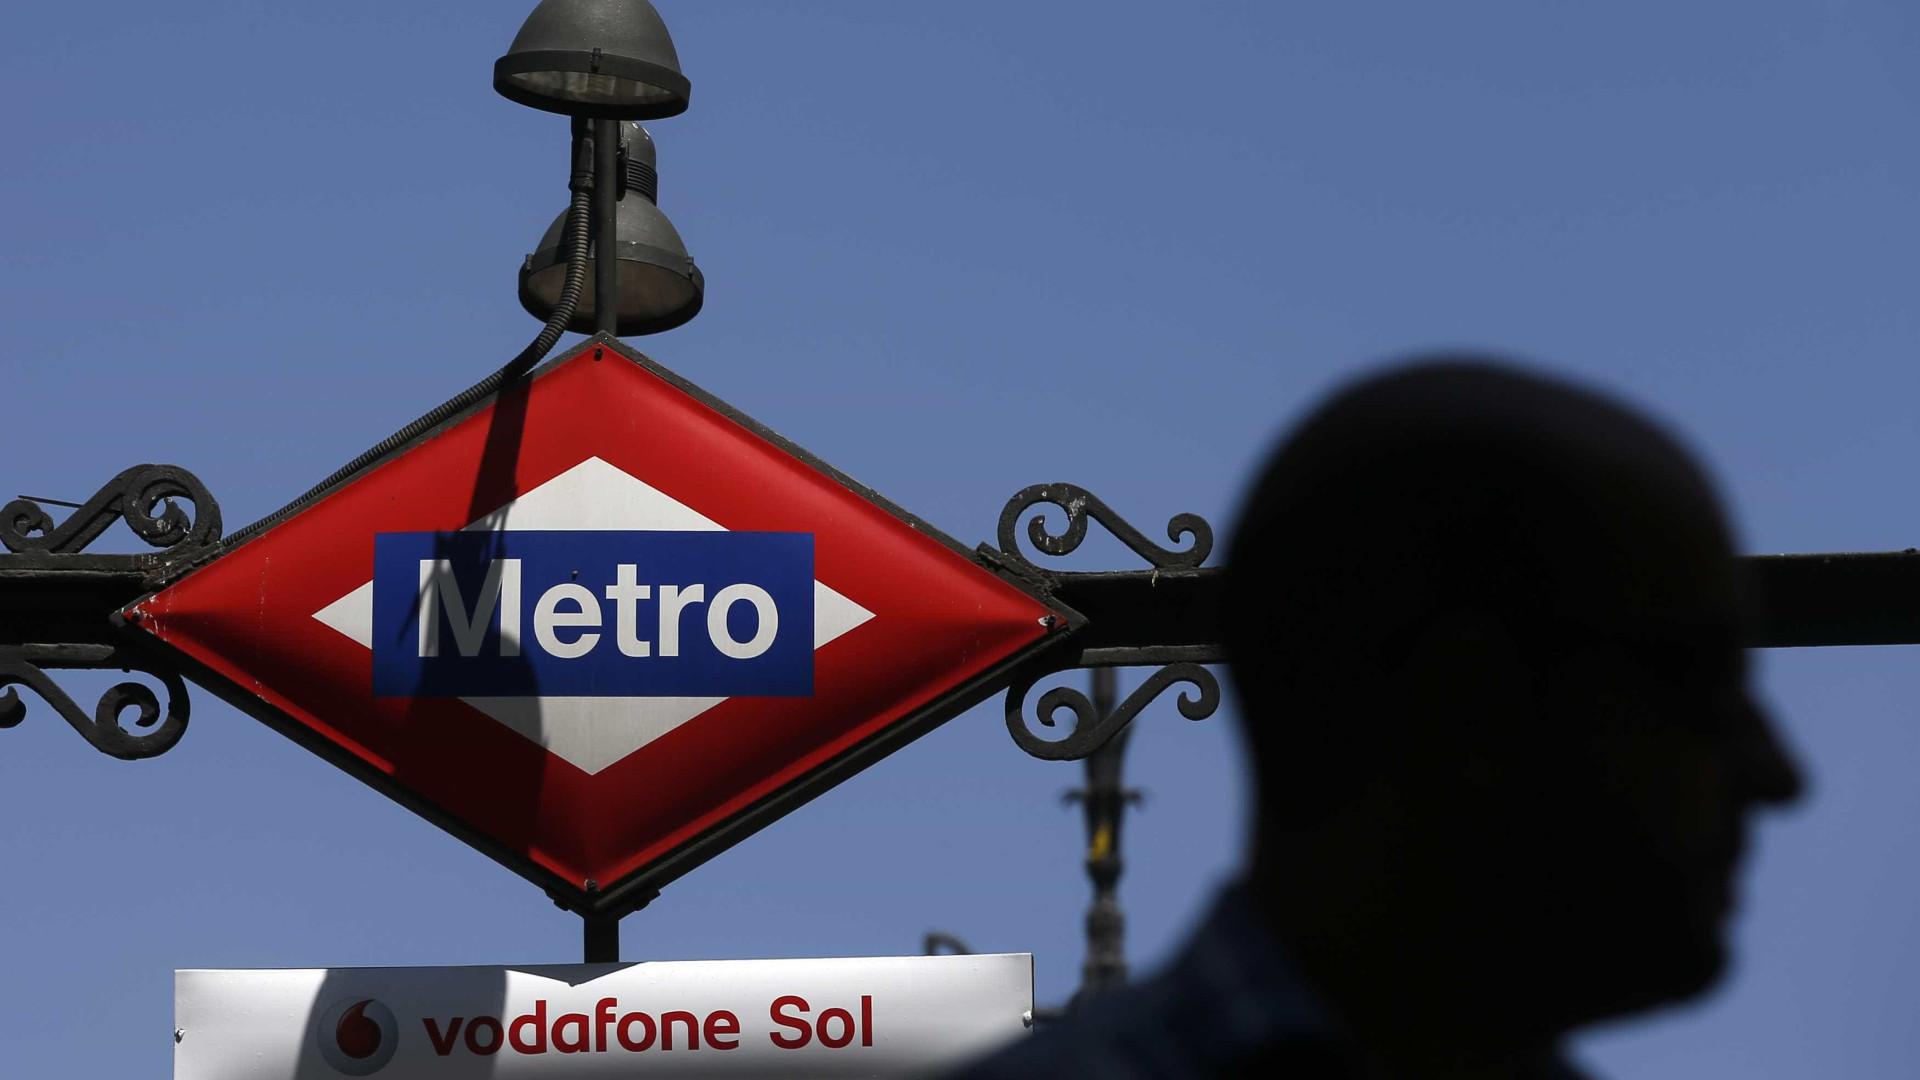 Suspeita de bomba evacua trens em Barcelona